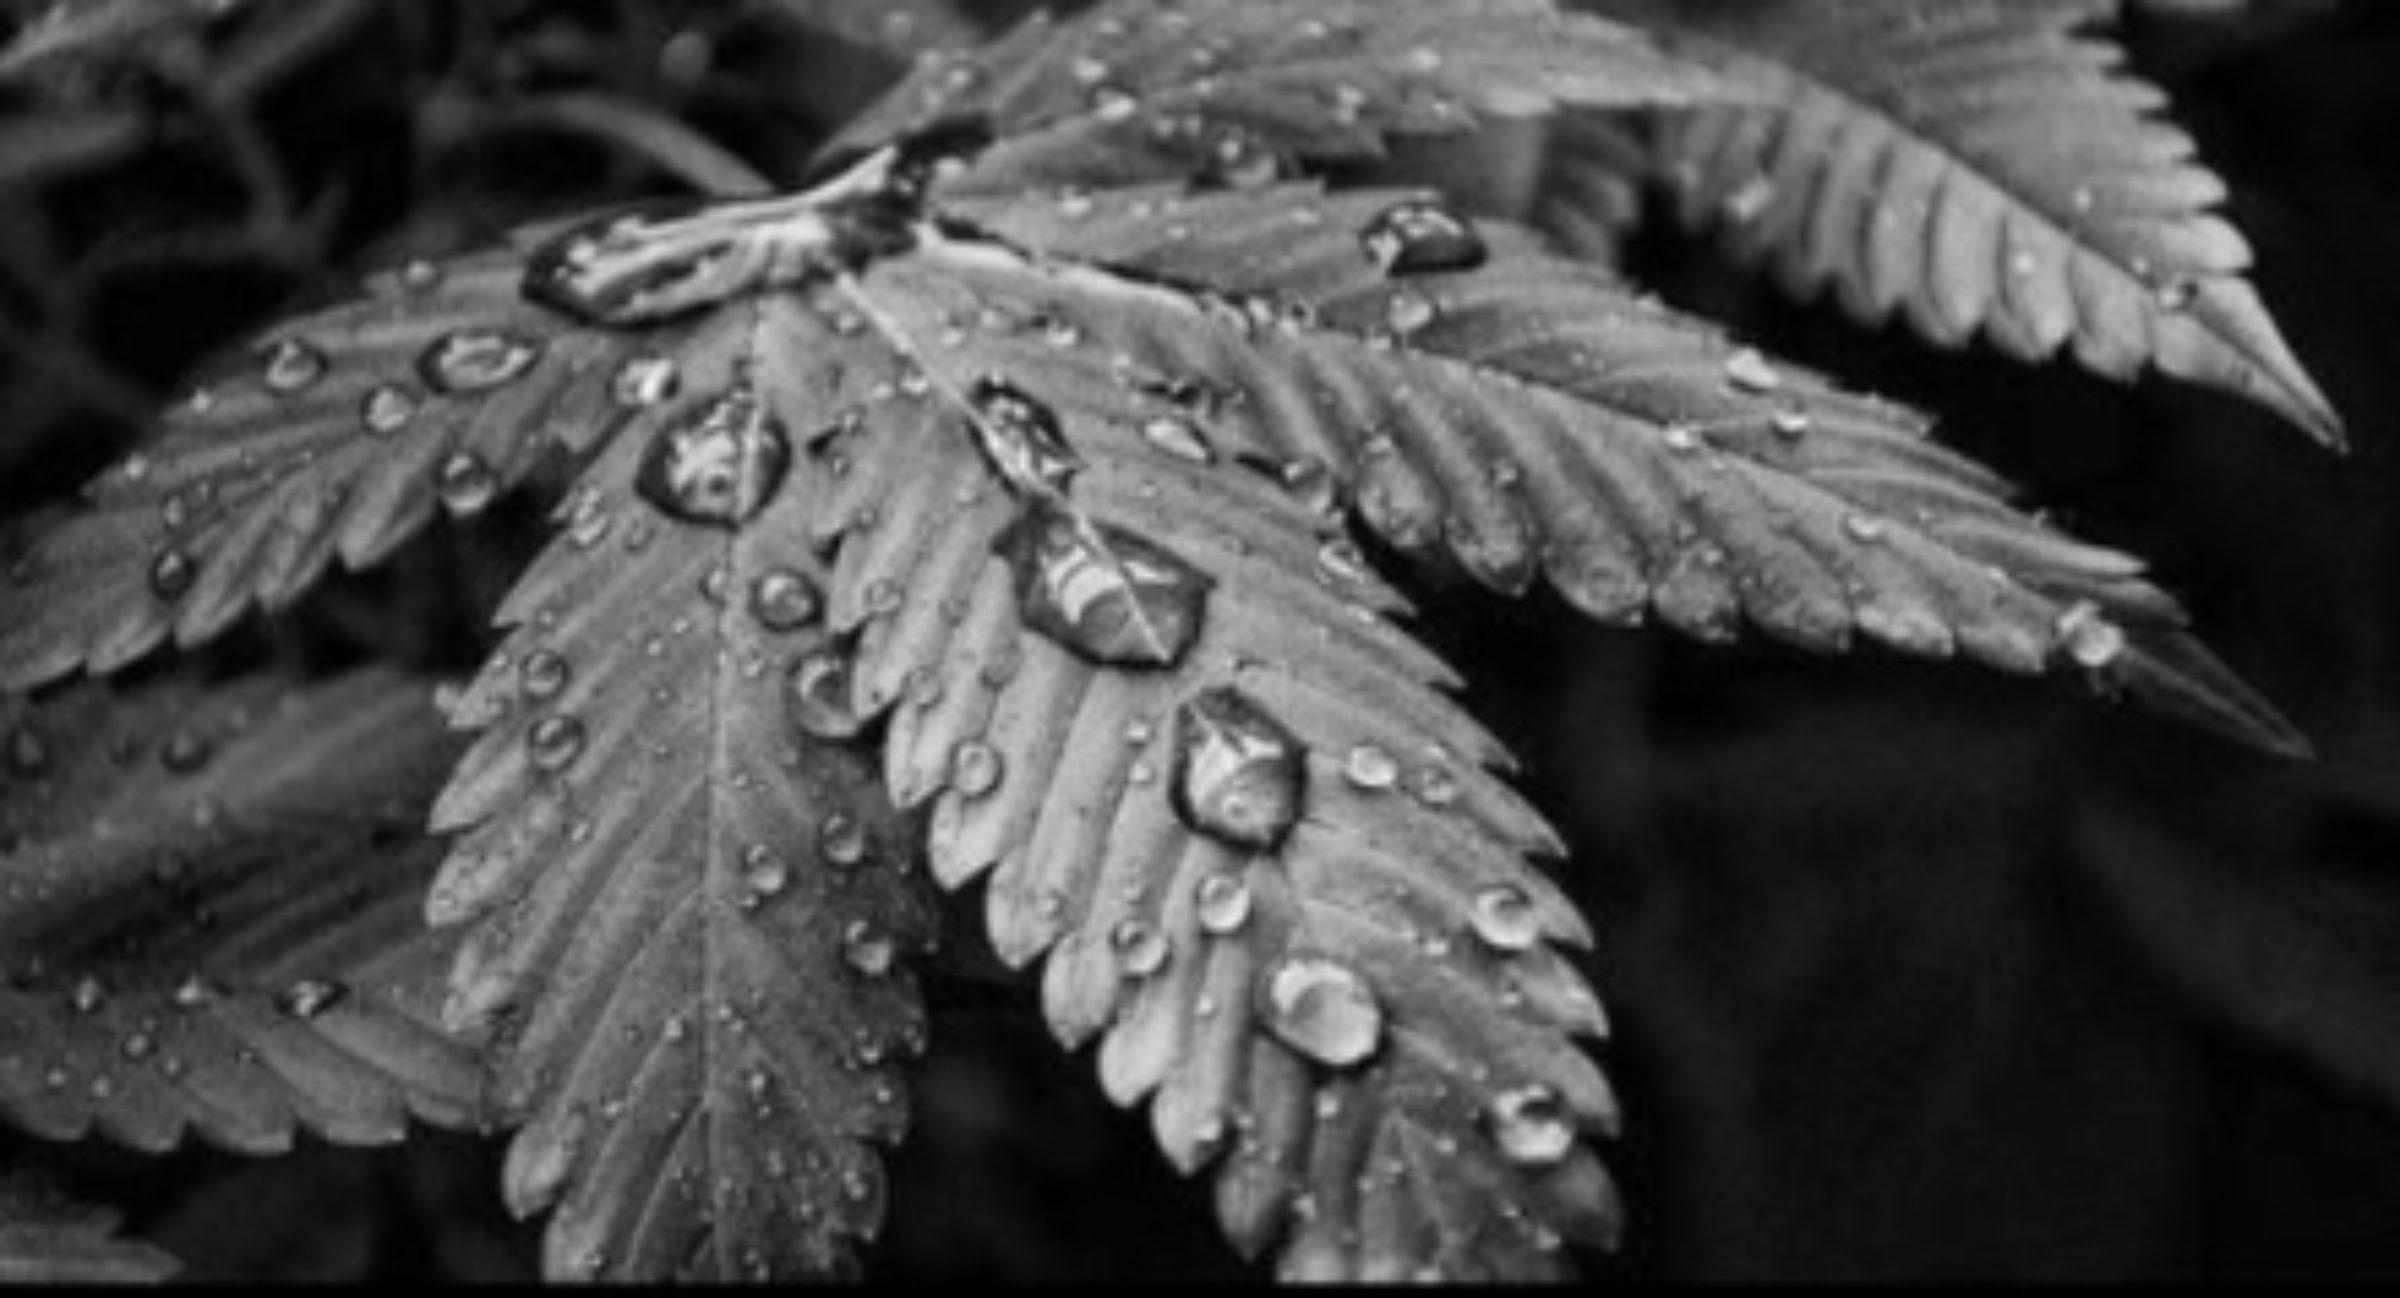 Emerald Zoo Den: Big Ass Cannabis Fan Leaf black and white